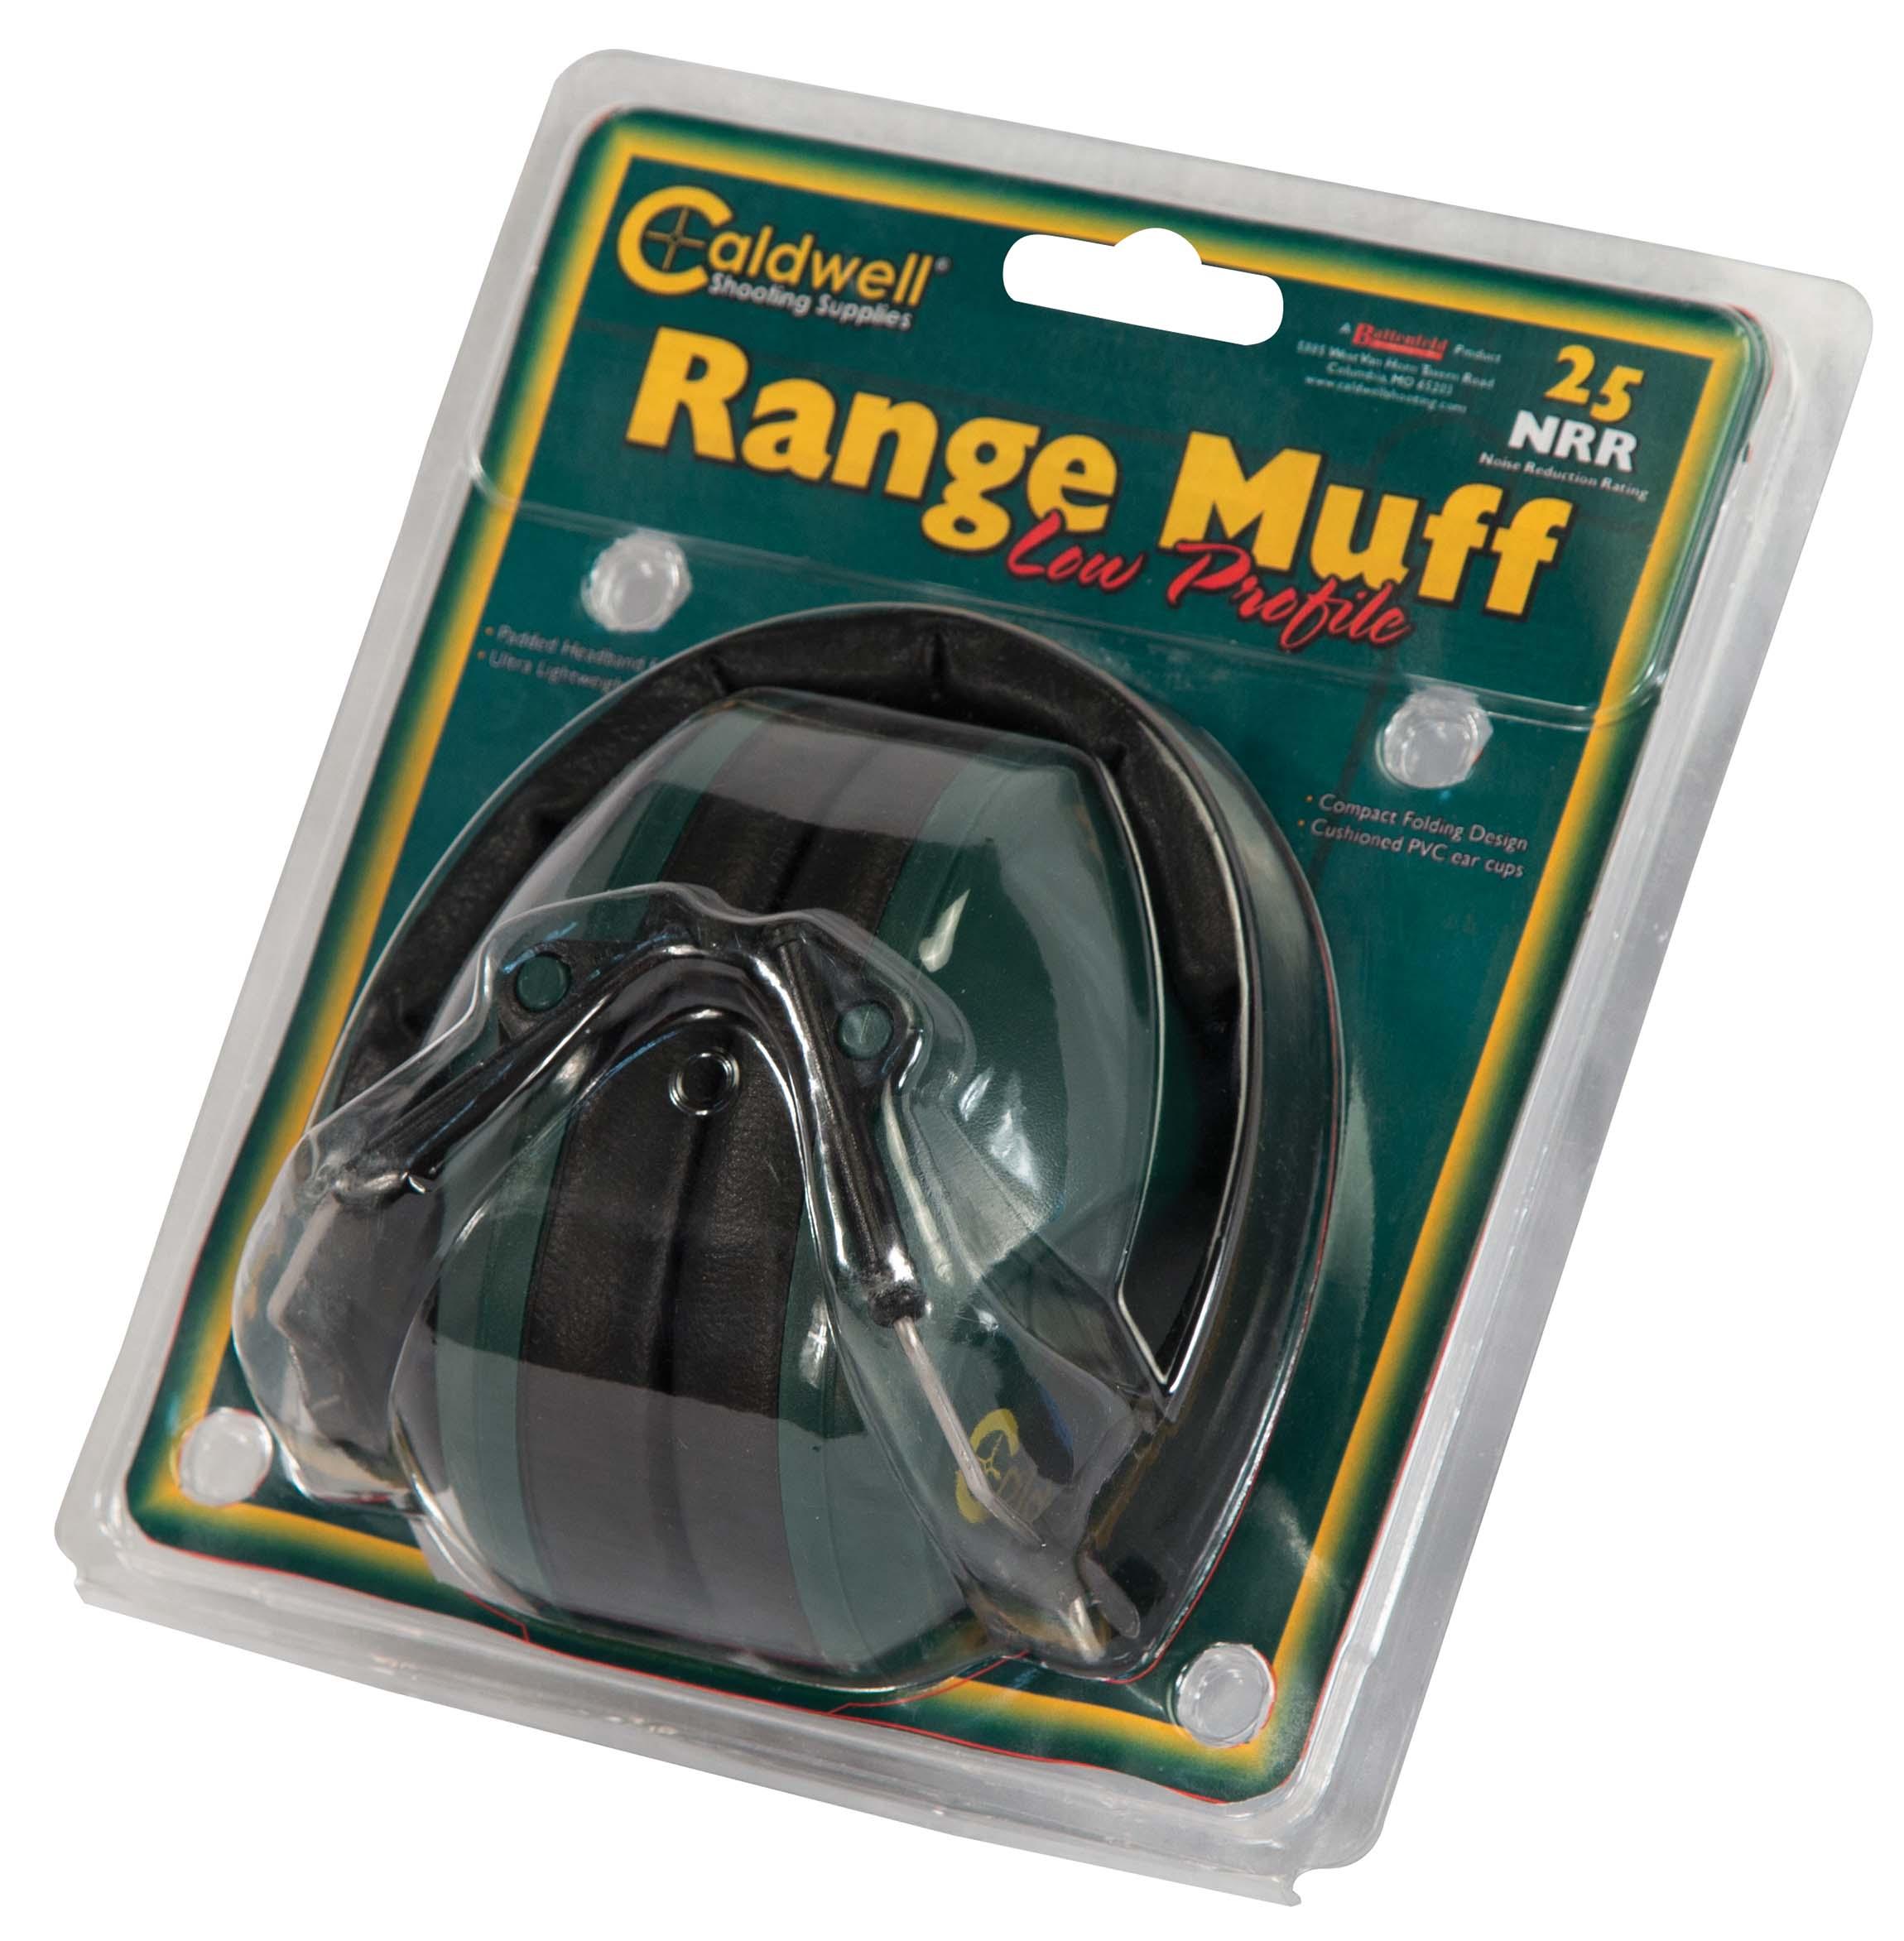 Range Muff Low Profile, NRR 25 - 498024 Clam Display